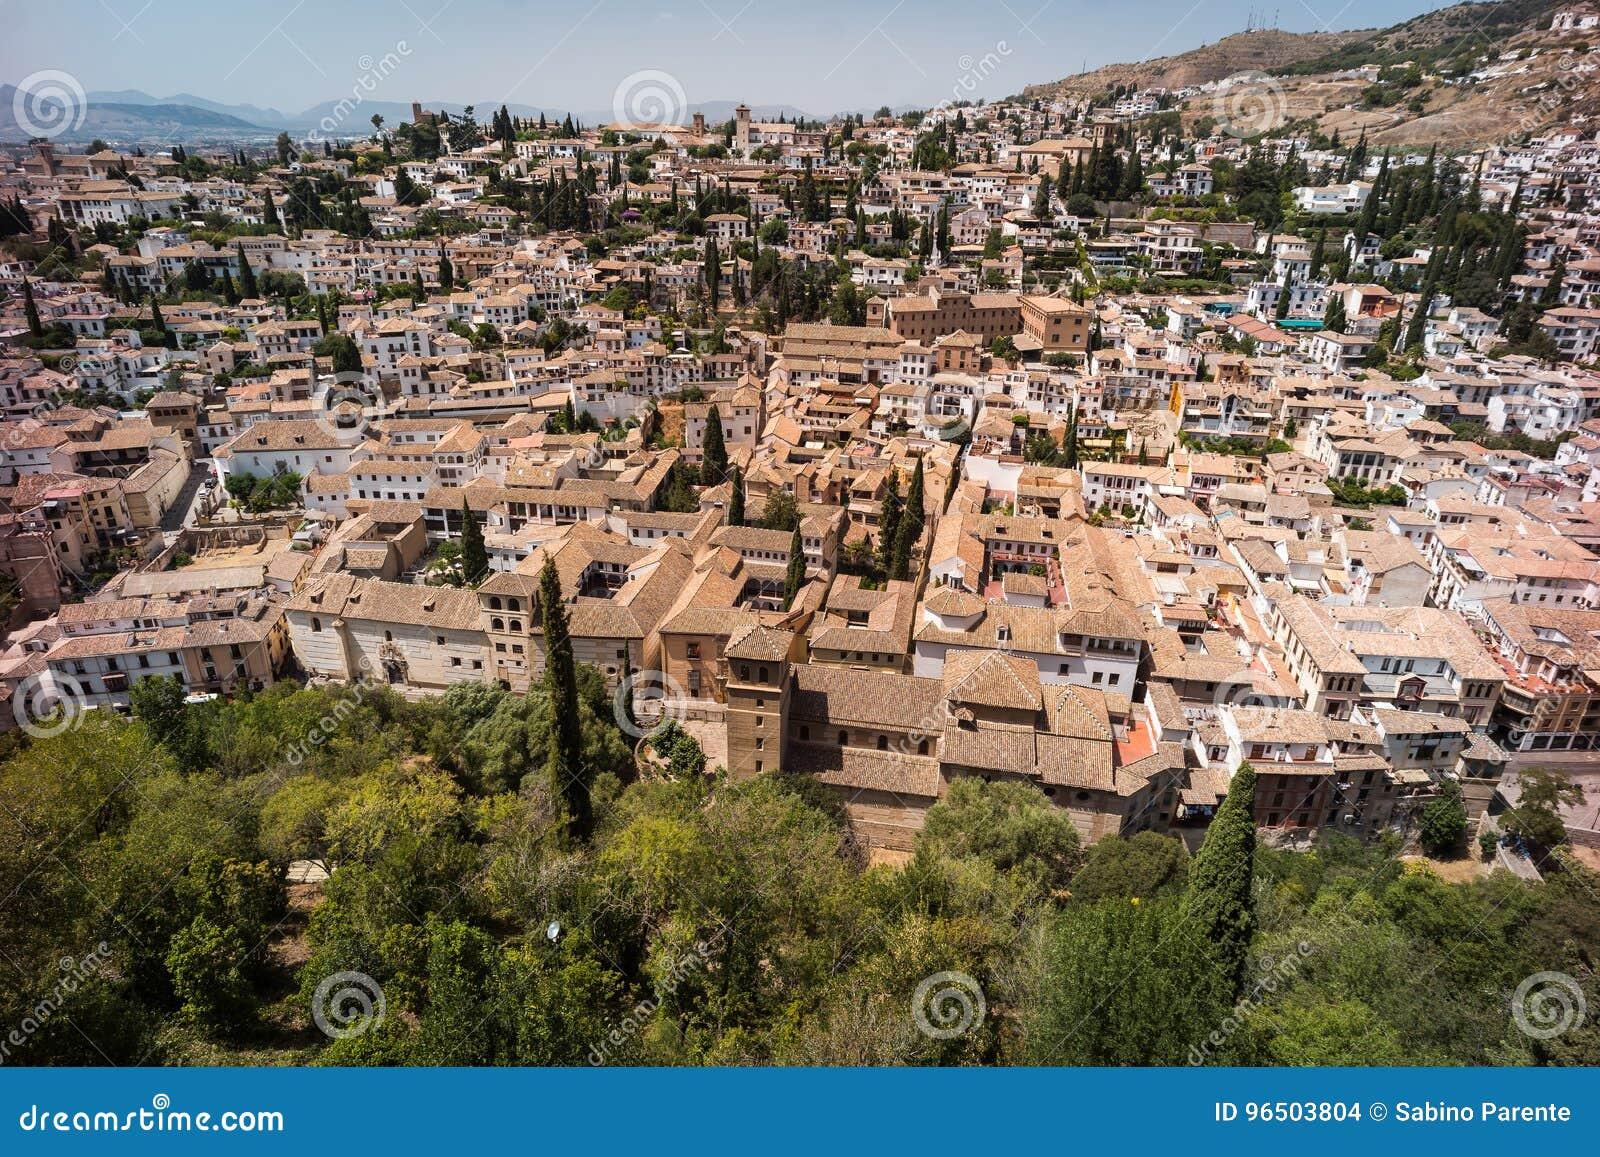 Granada, View Of The Albaicin And Sacromonte Stock Photo